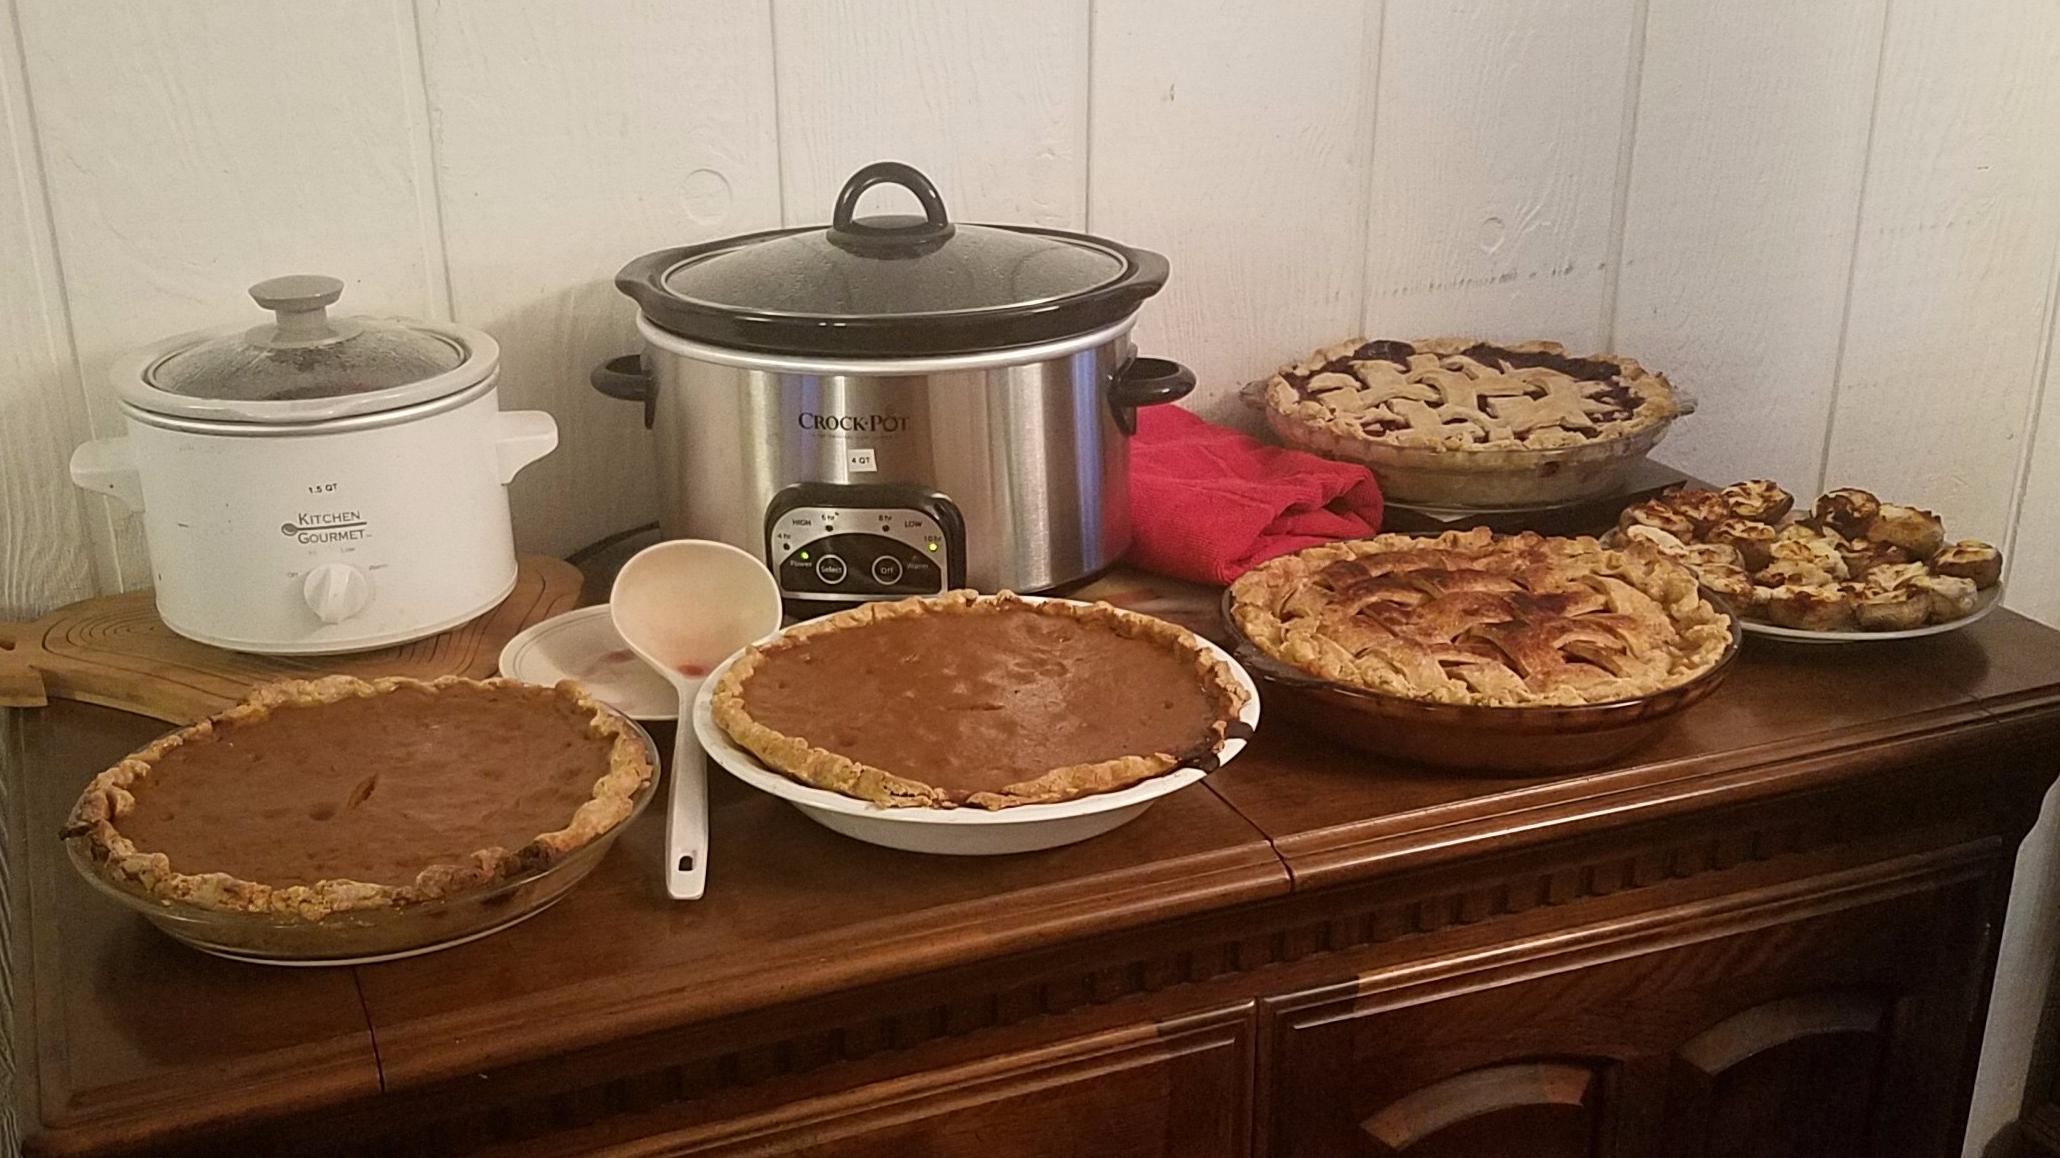 Accidental Cream Pie Good accidental pie – kerry blaisdell